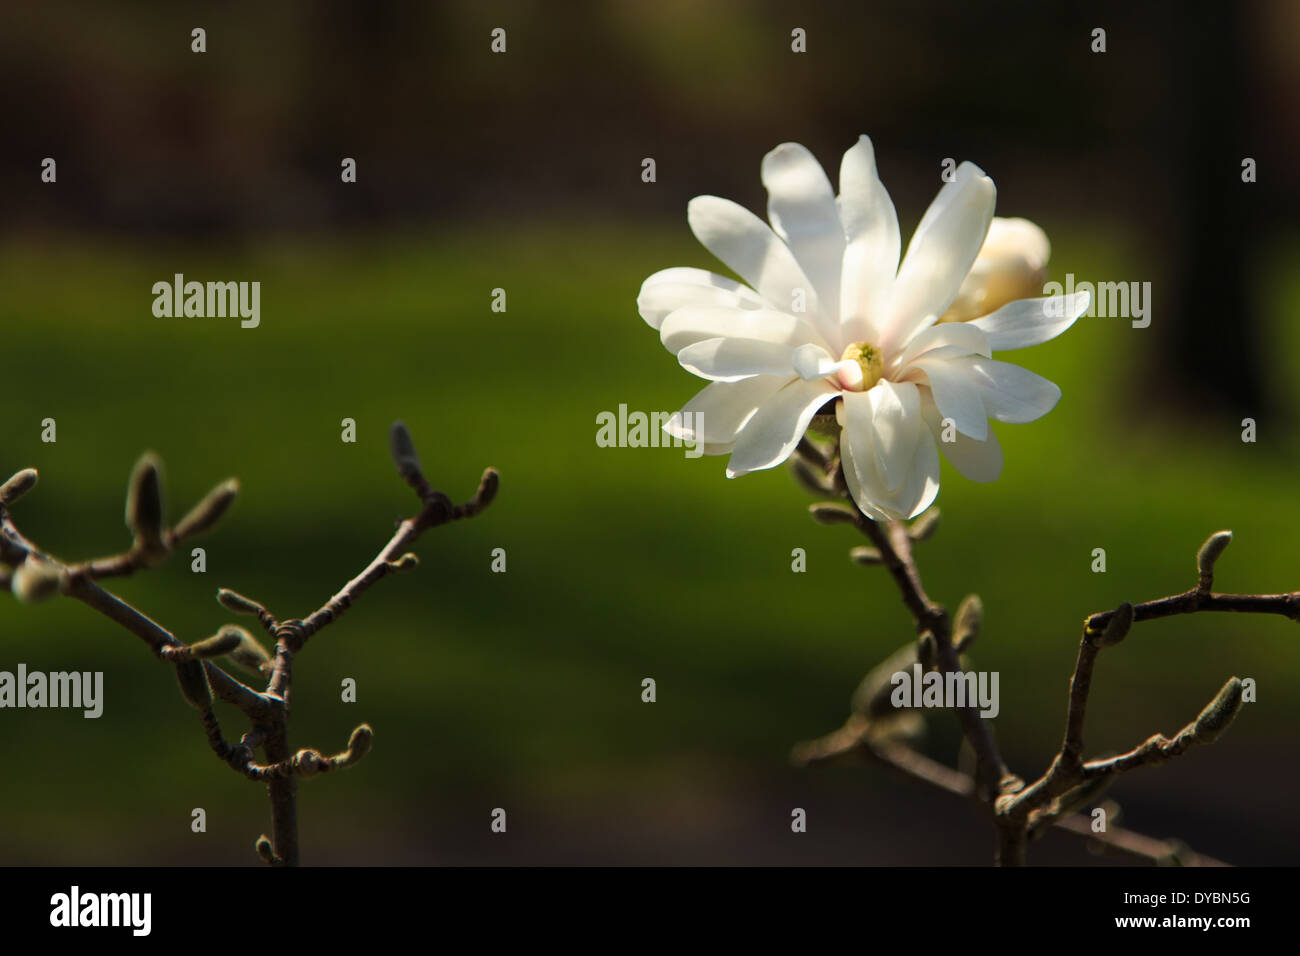 Single Tree Blossom in a Park near Reading, PA - Stock Image